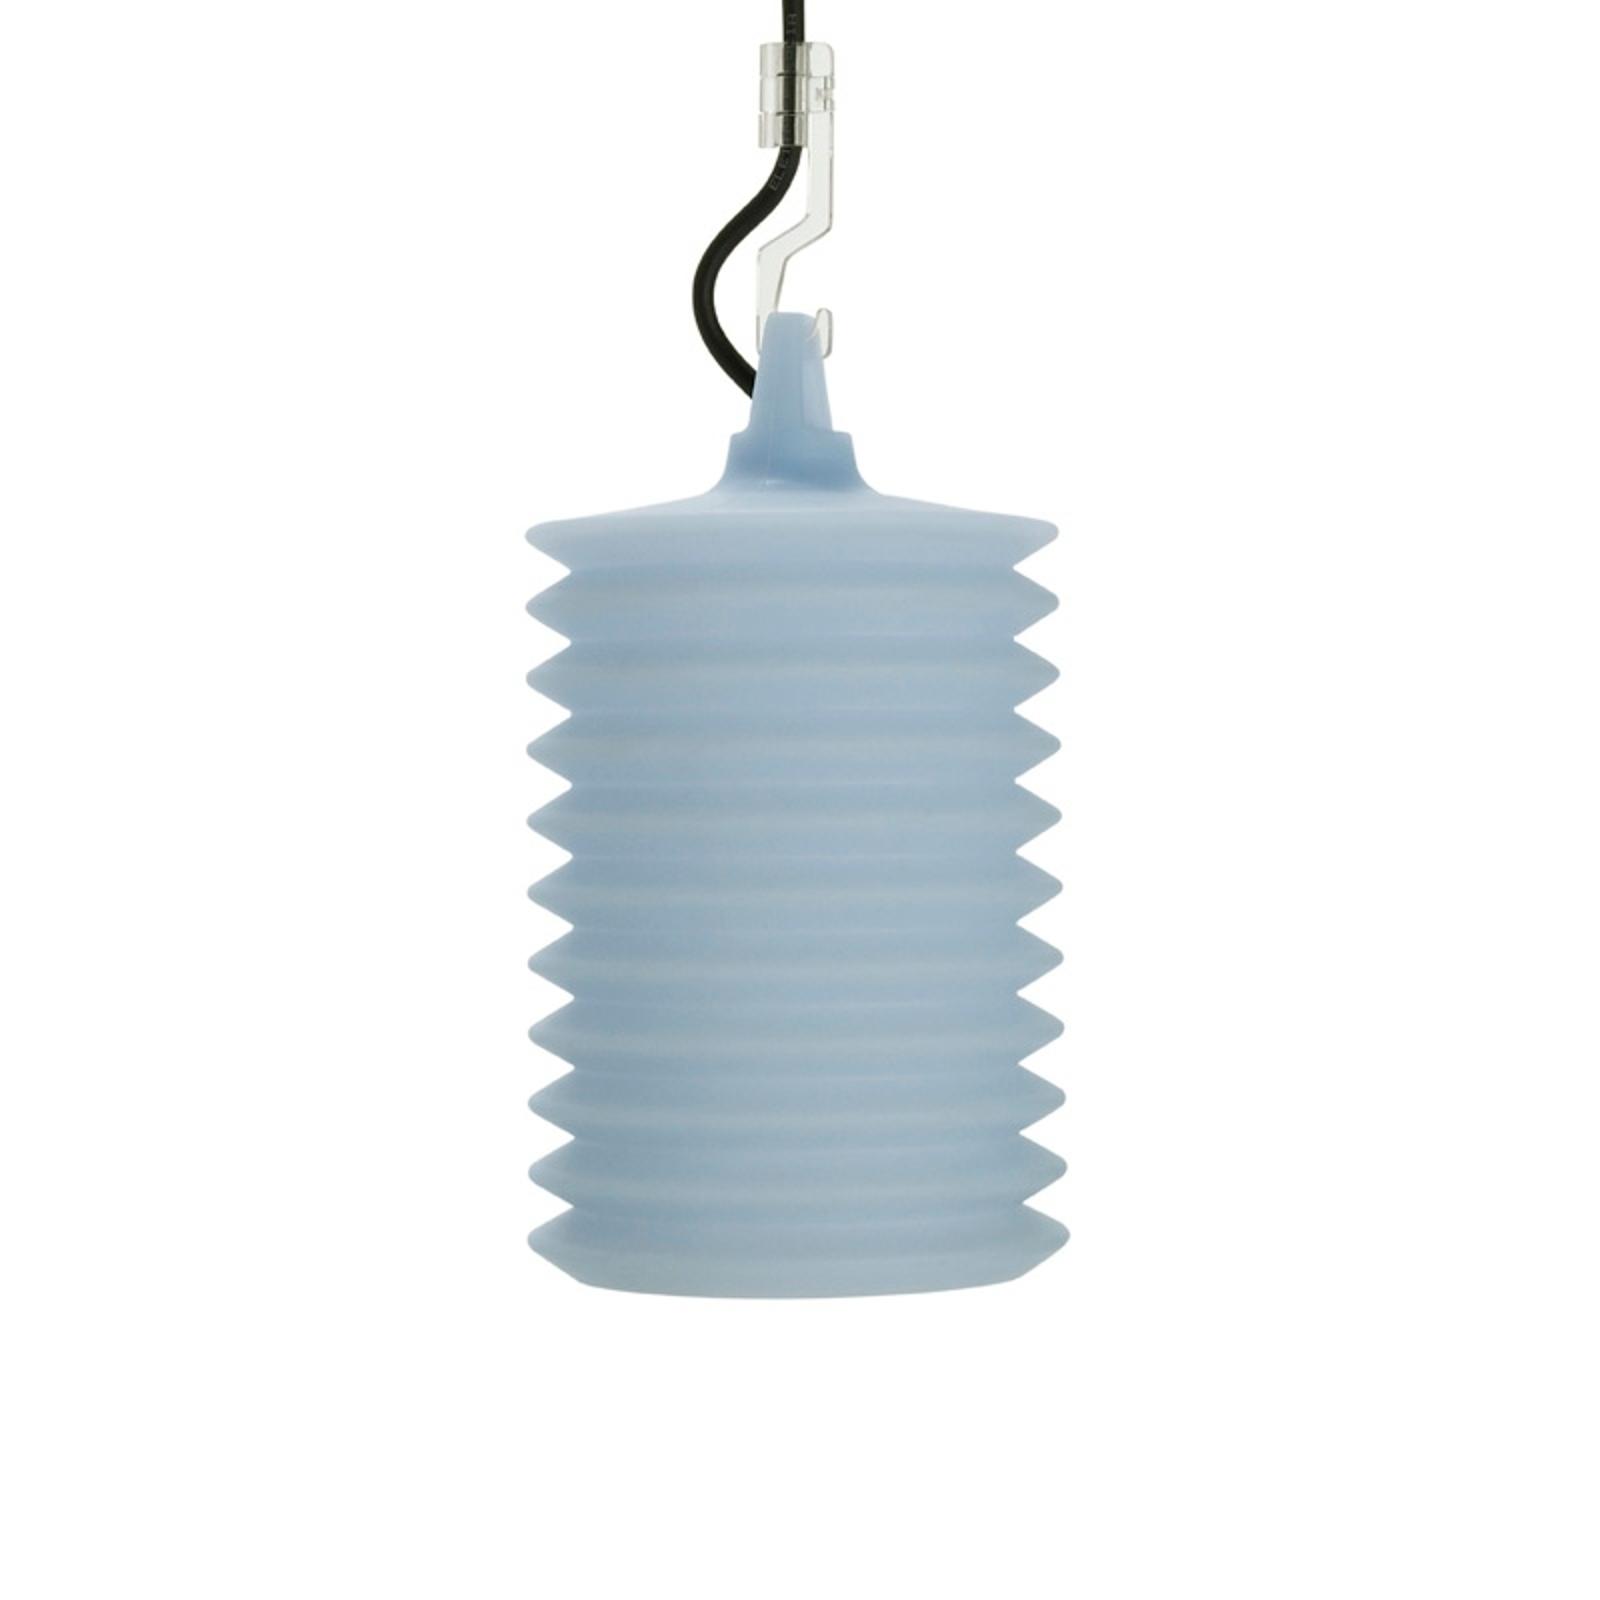 Rotaliana Lampion H1 - Hängeleuchte in Blau